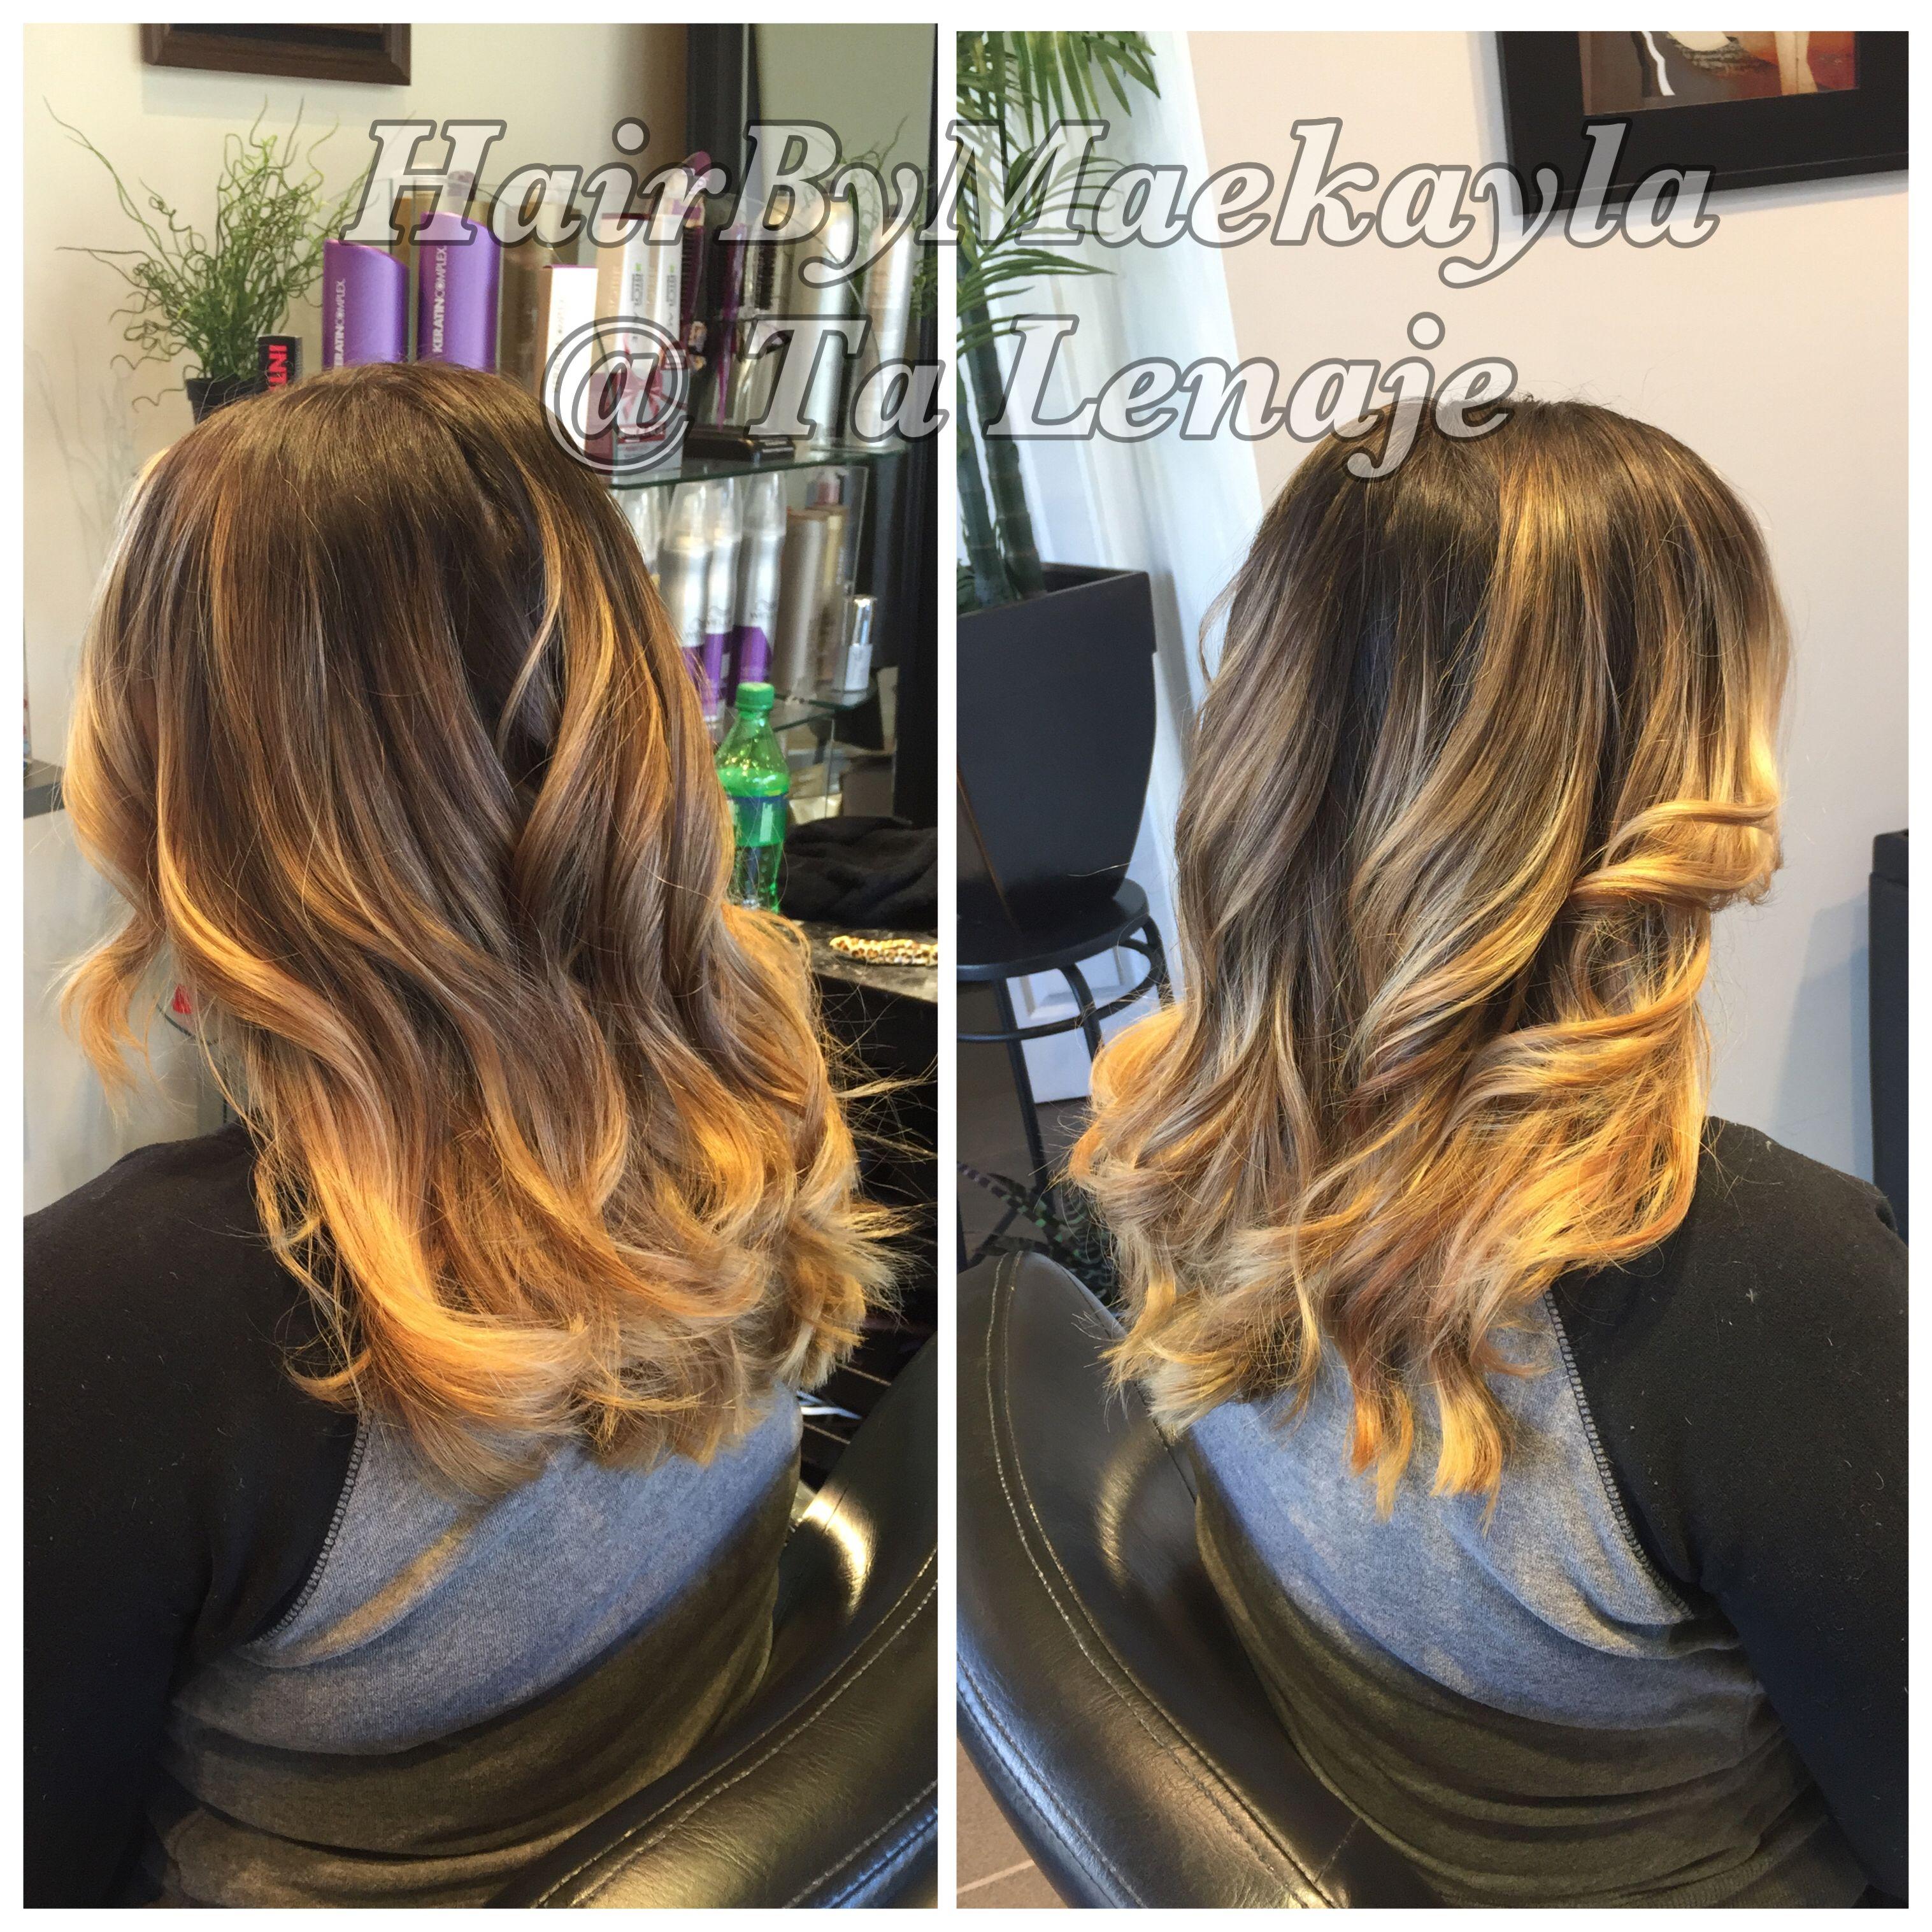 Balayage ombré highlights  Hair by Maekayla  Salon Fauntleroy